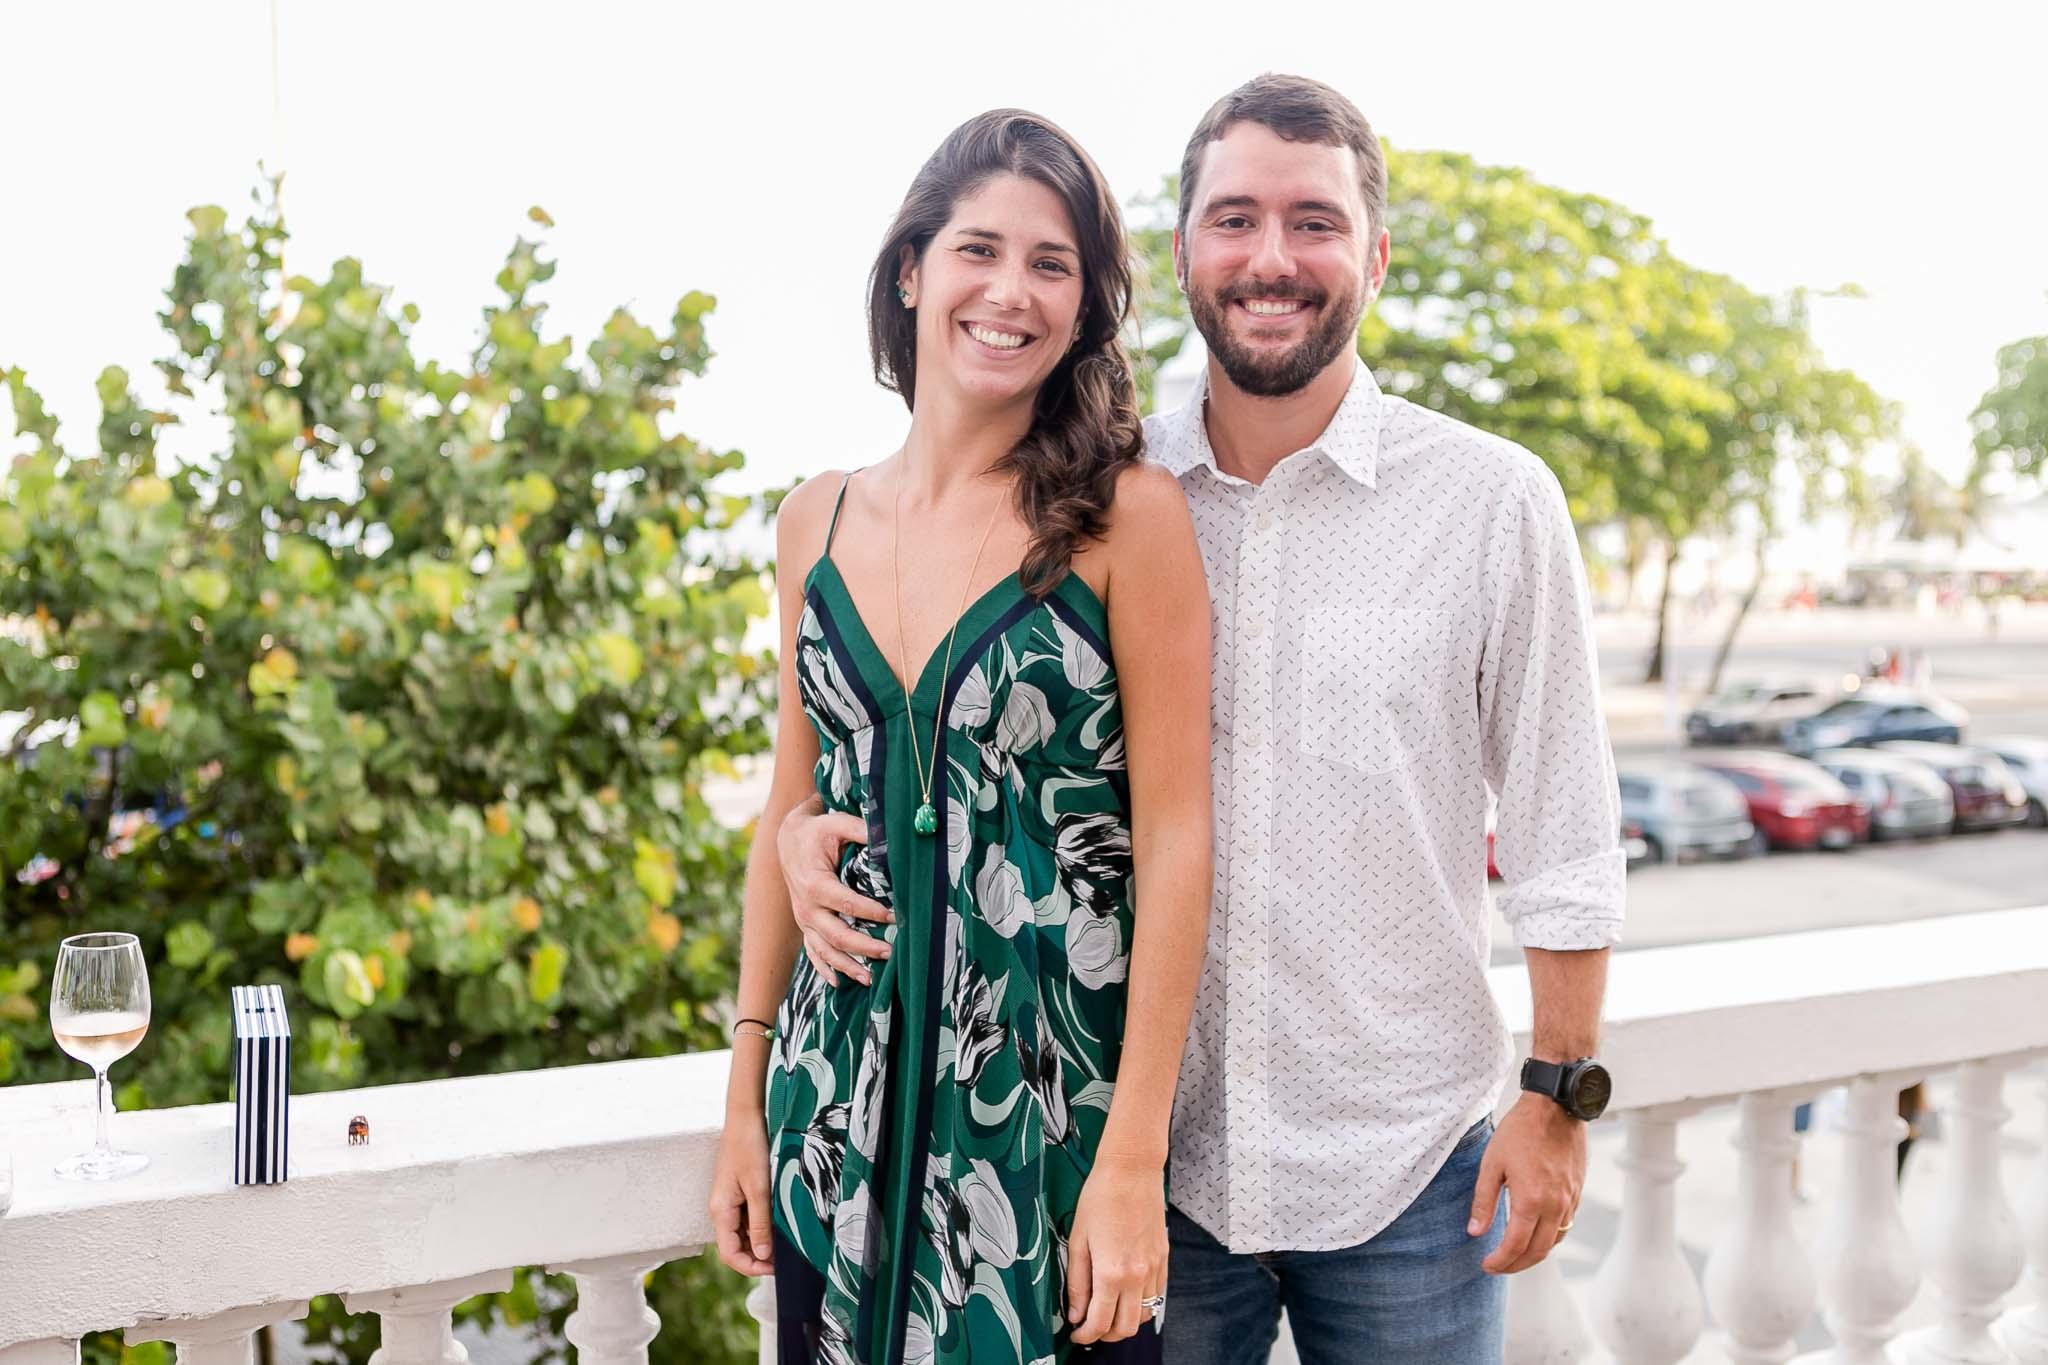 Mariella Lage Prado Kelly e Gabriel Sauer